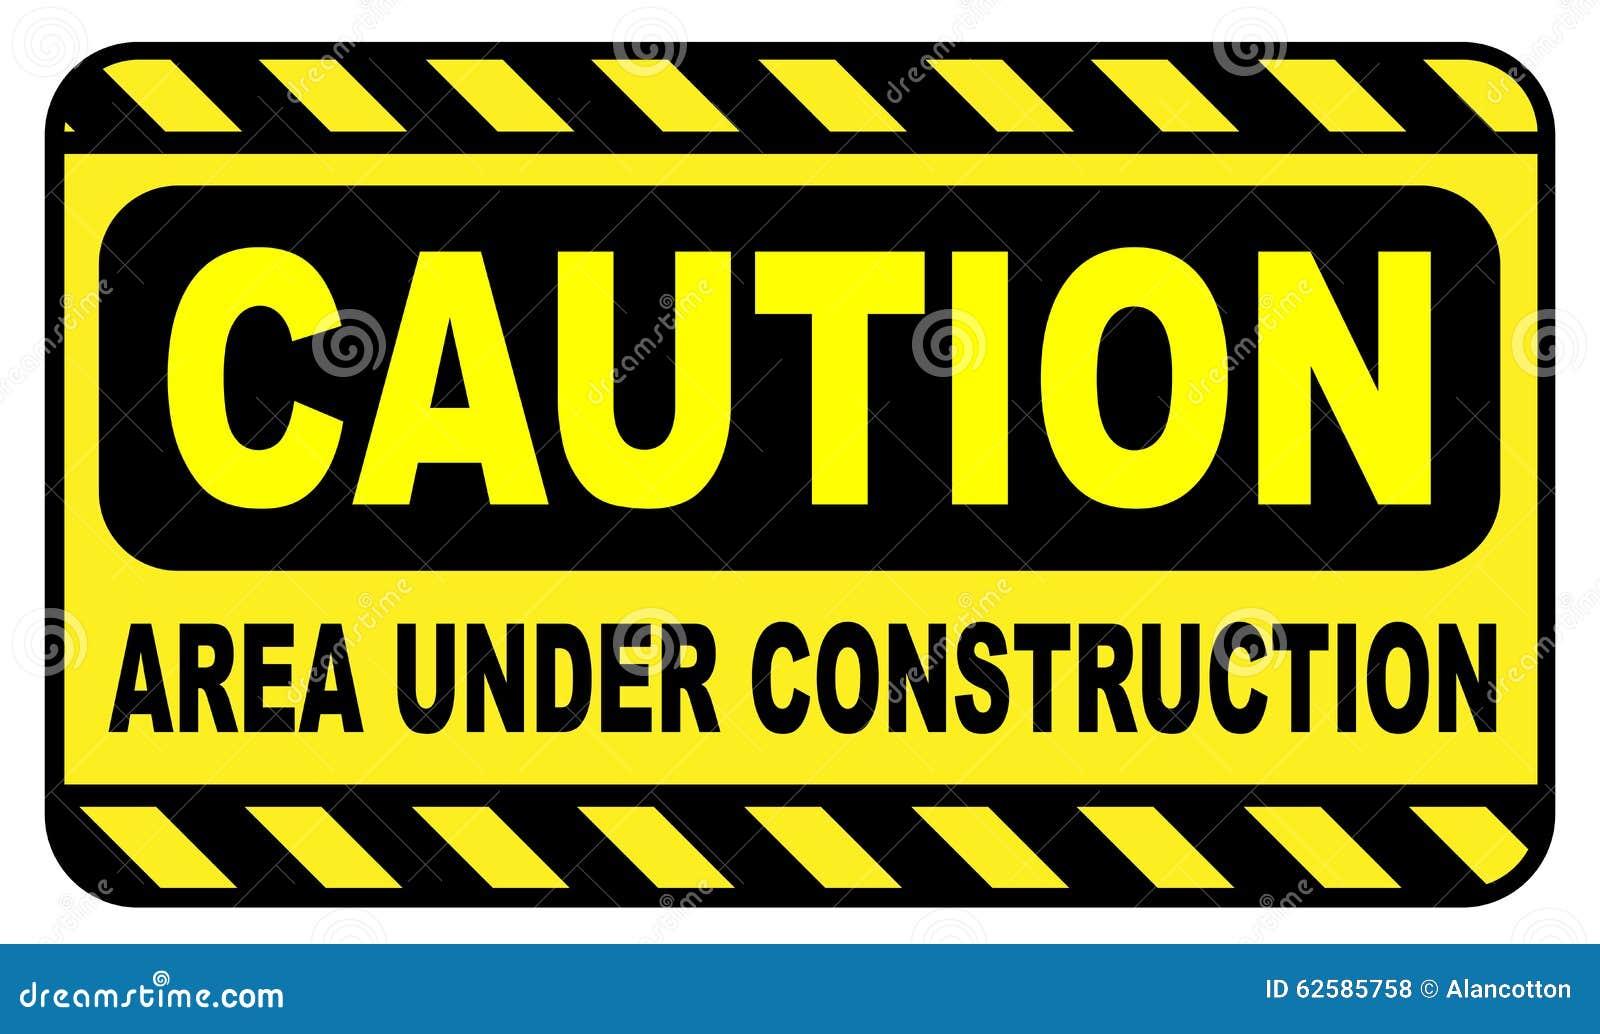 Caution Area Under Construction Stock Illustration